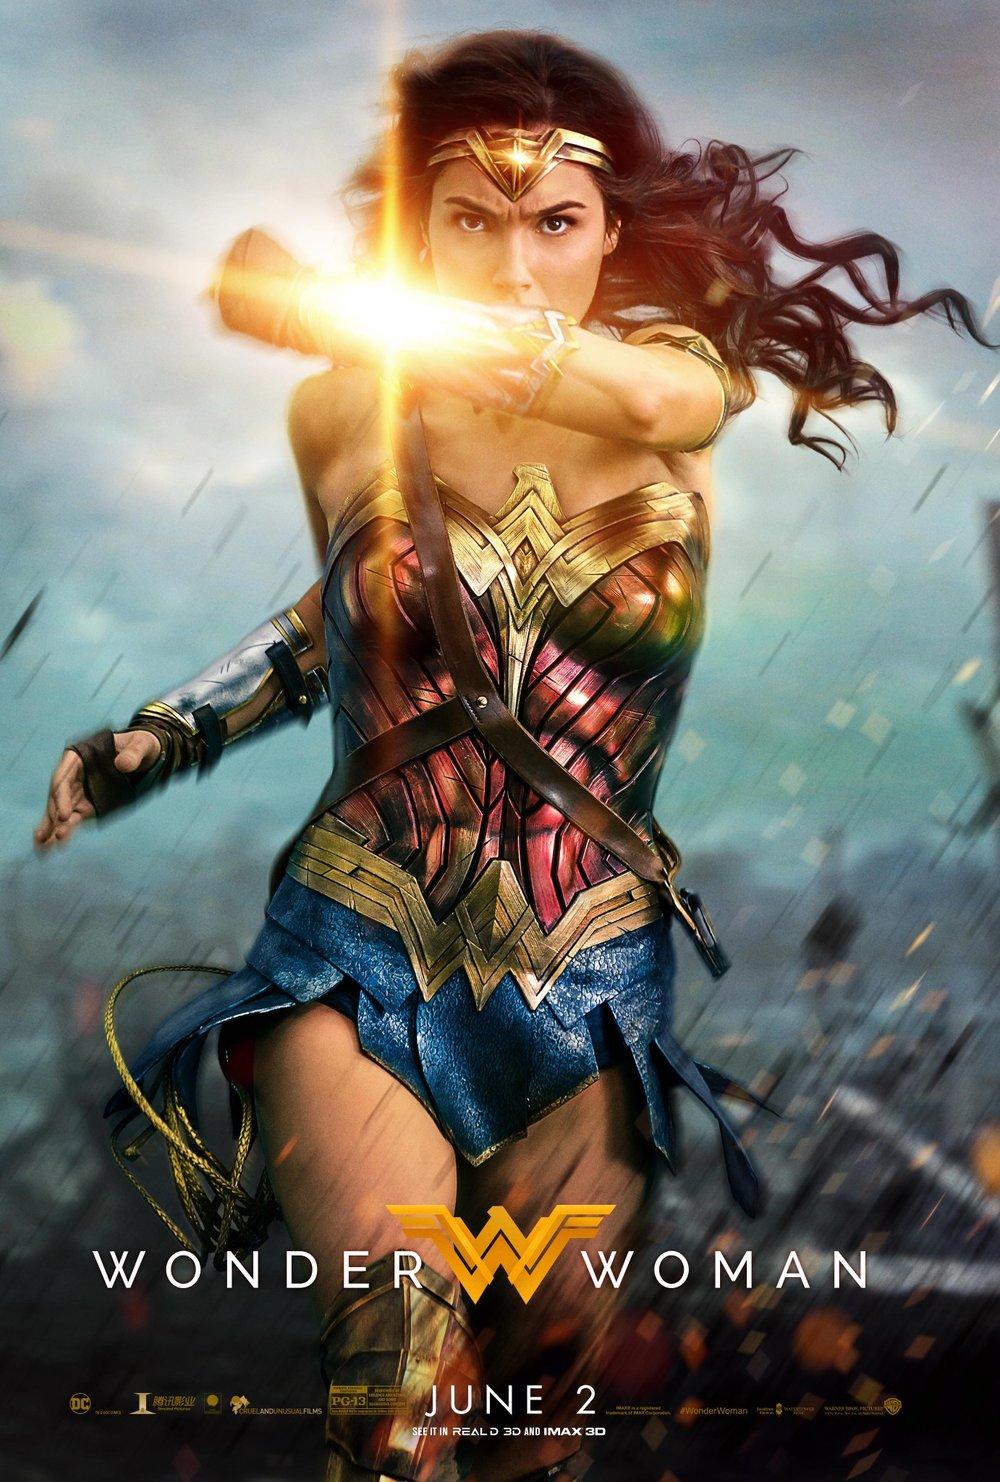 www.3dor2d.com/reviews/wonder-woman